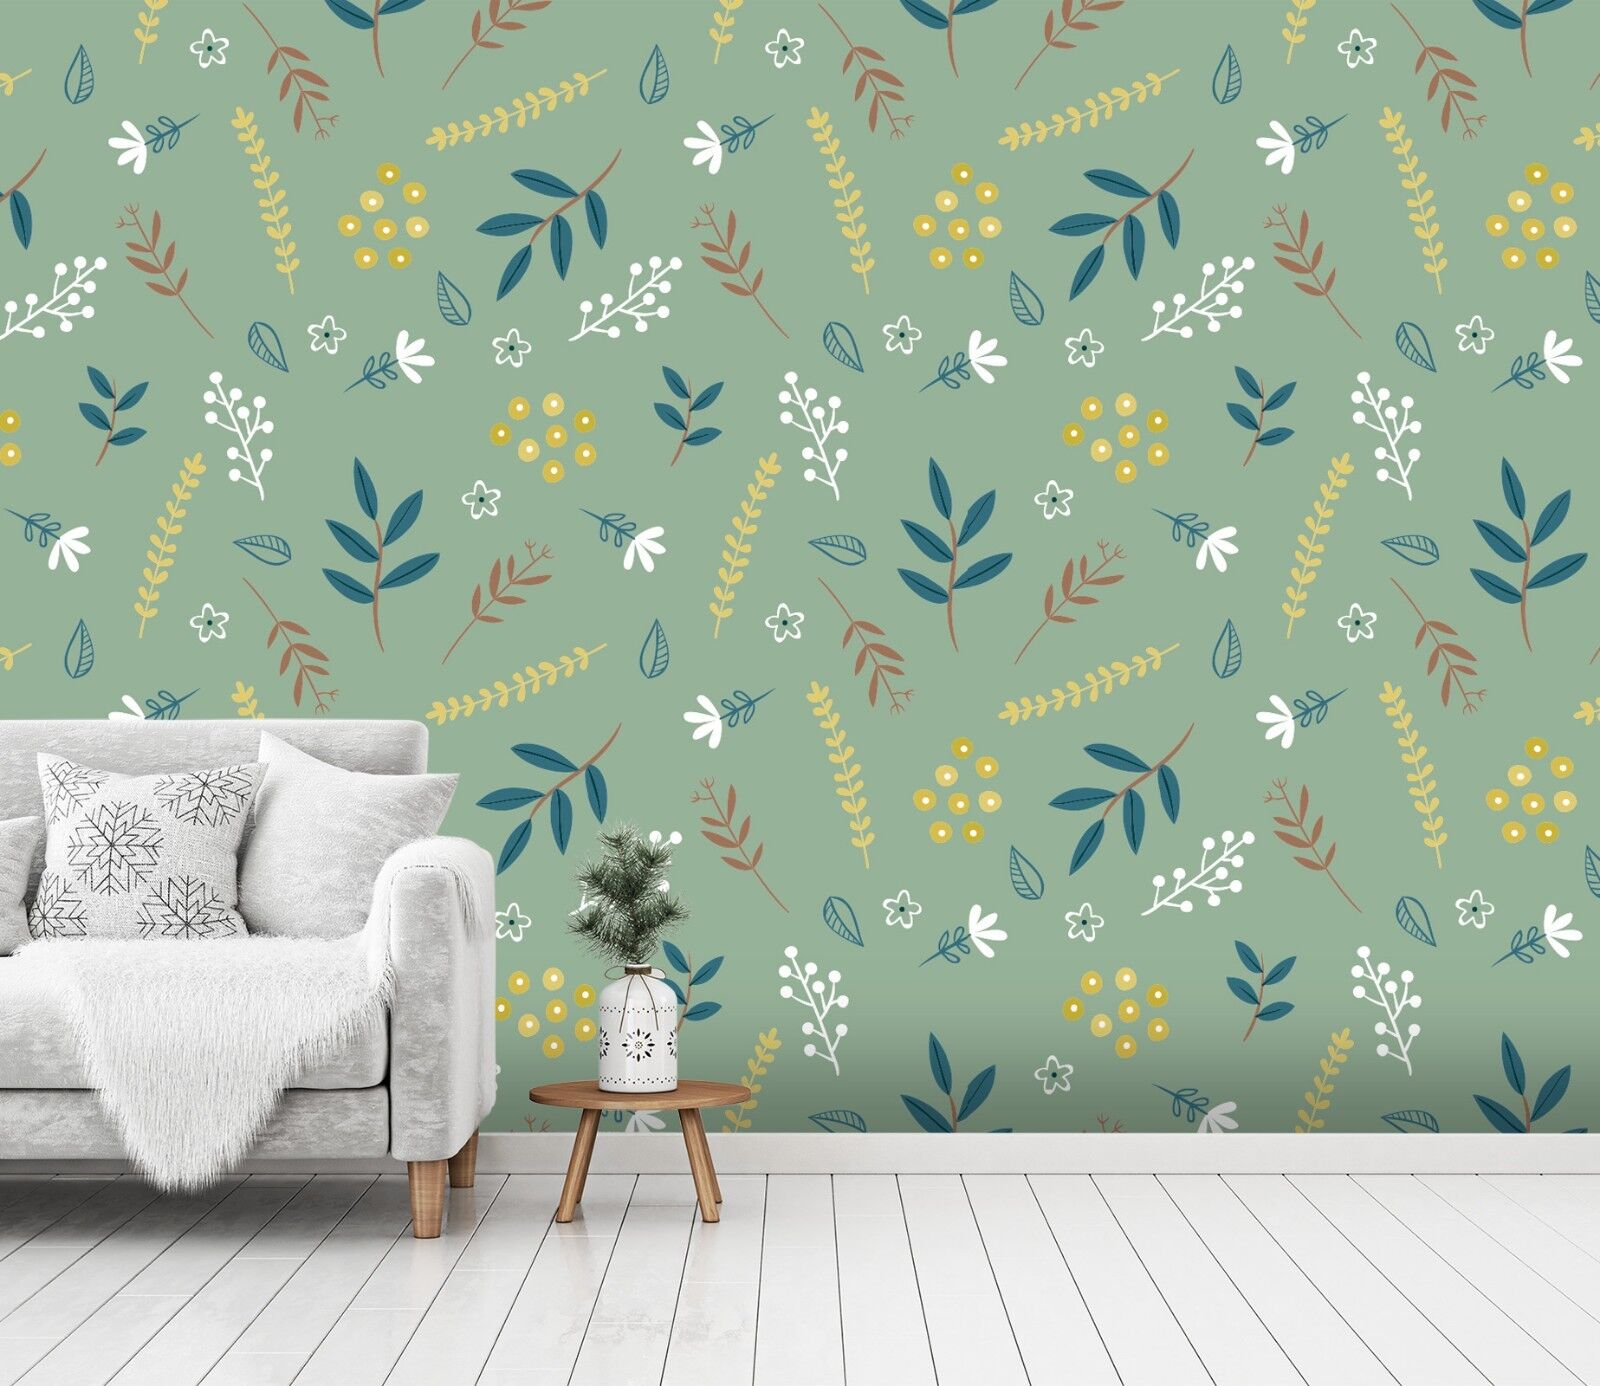 3D Leaves Pattern 2 Wallpaper Mural Print Wall Indoor Wallpaper Murals UK Summer